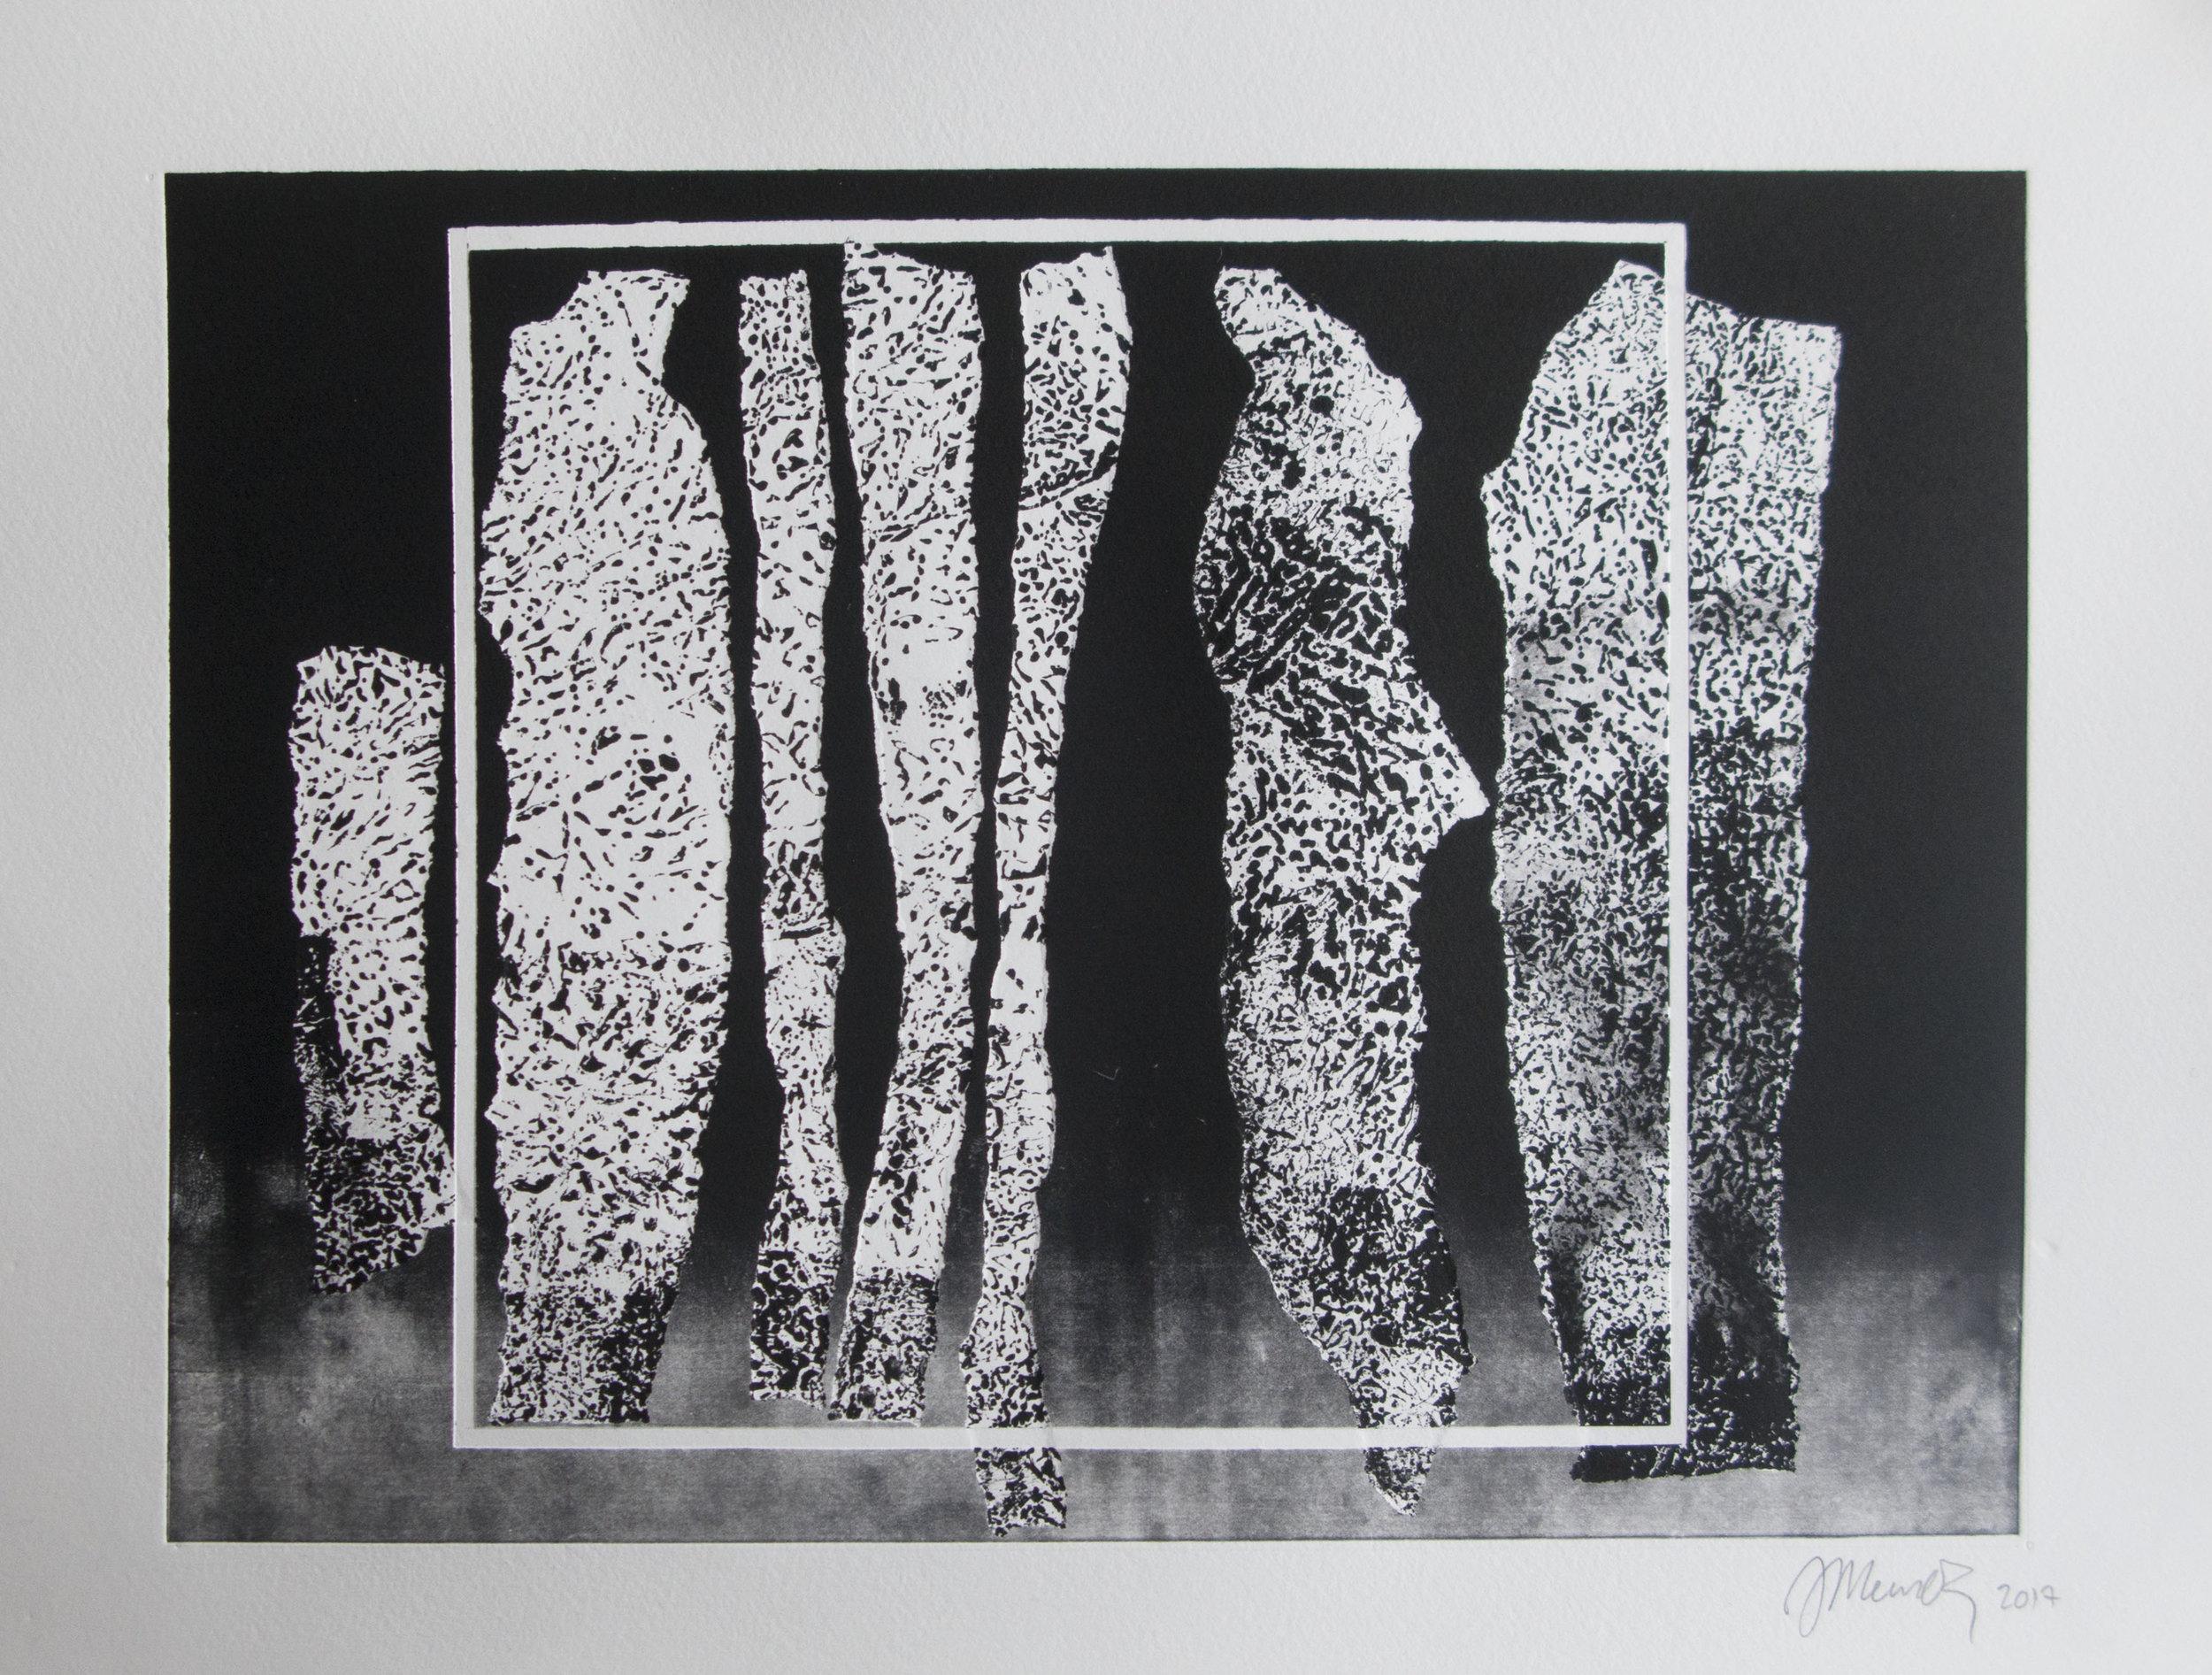 Forms on black 21 (32cm x 26 cm)